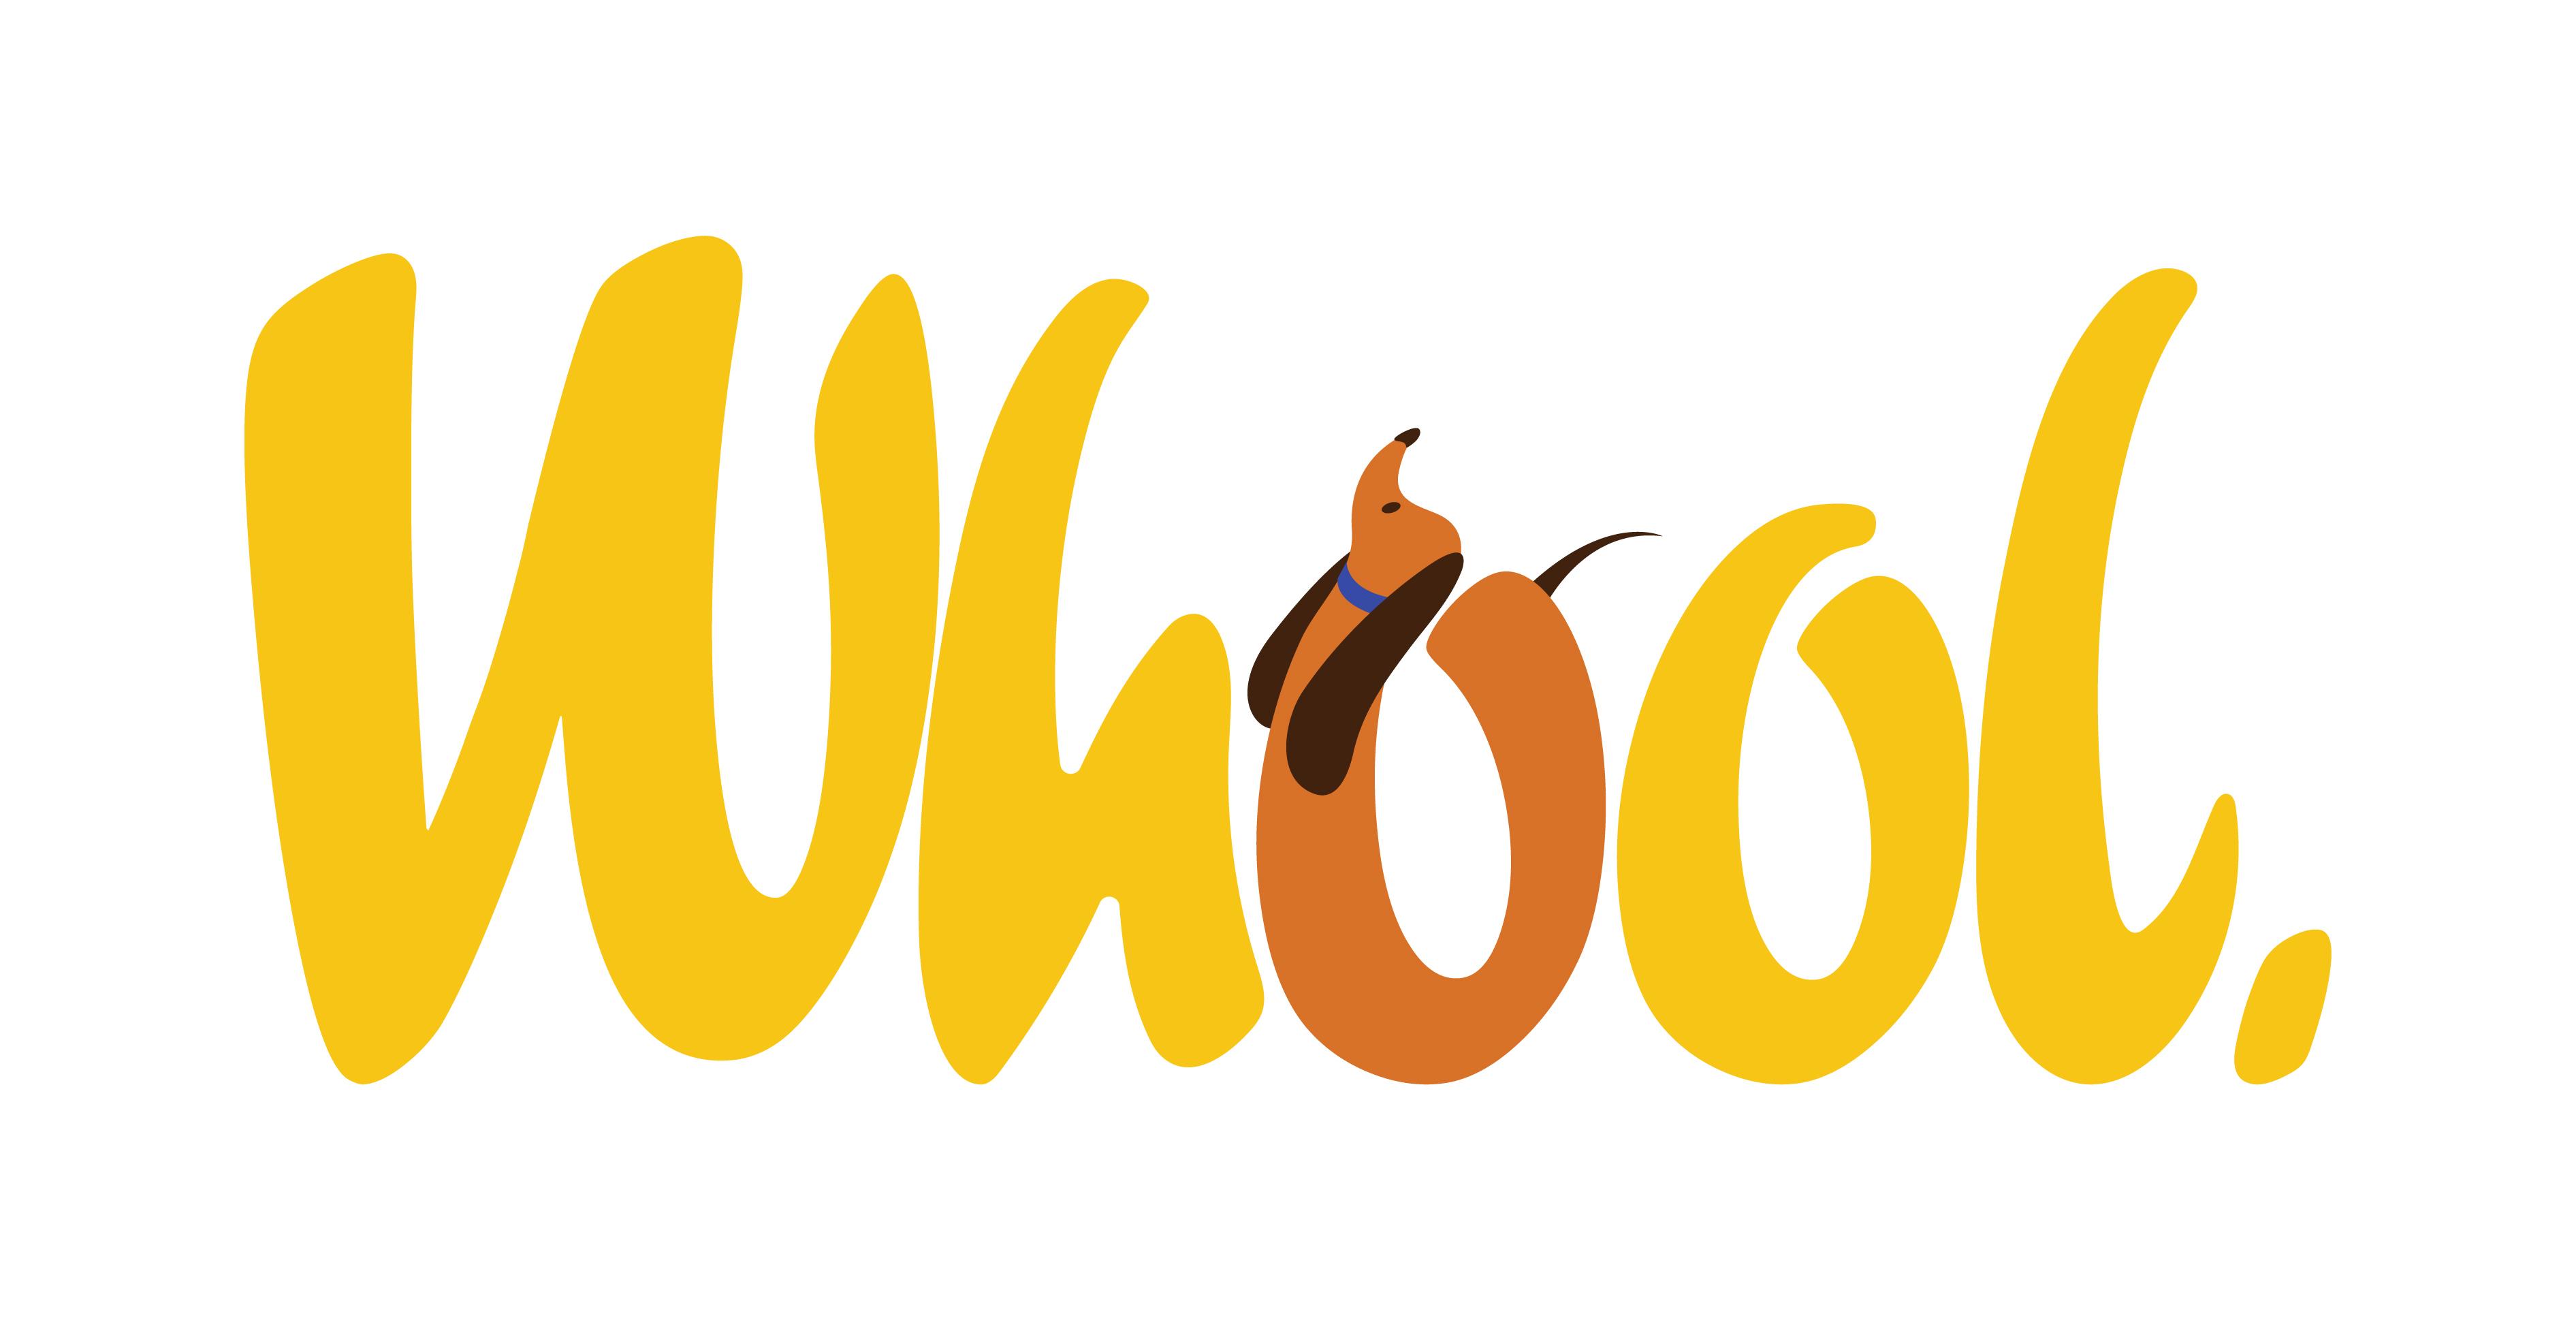 wooollogo